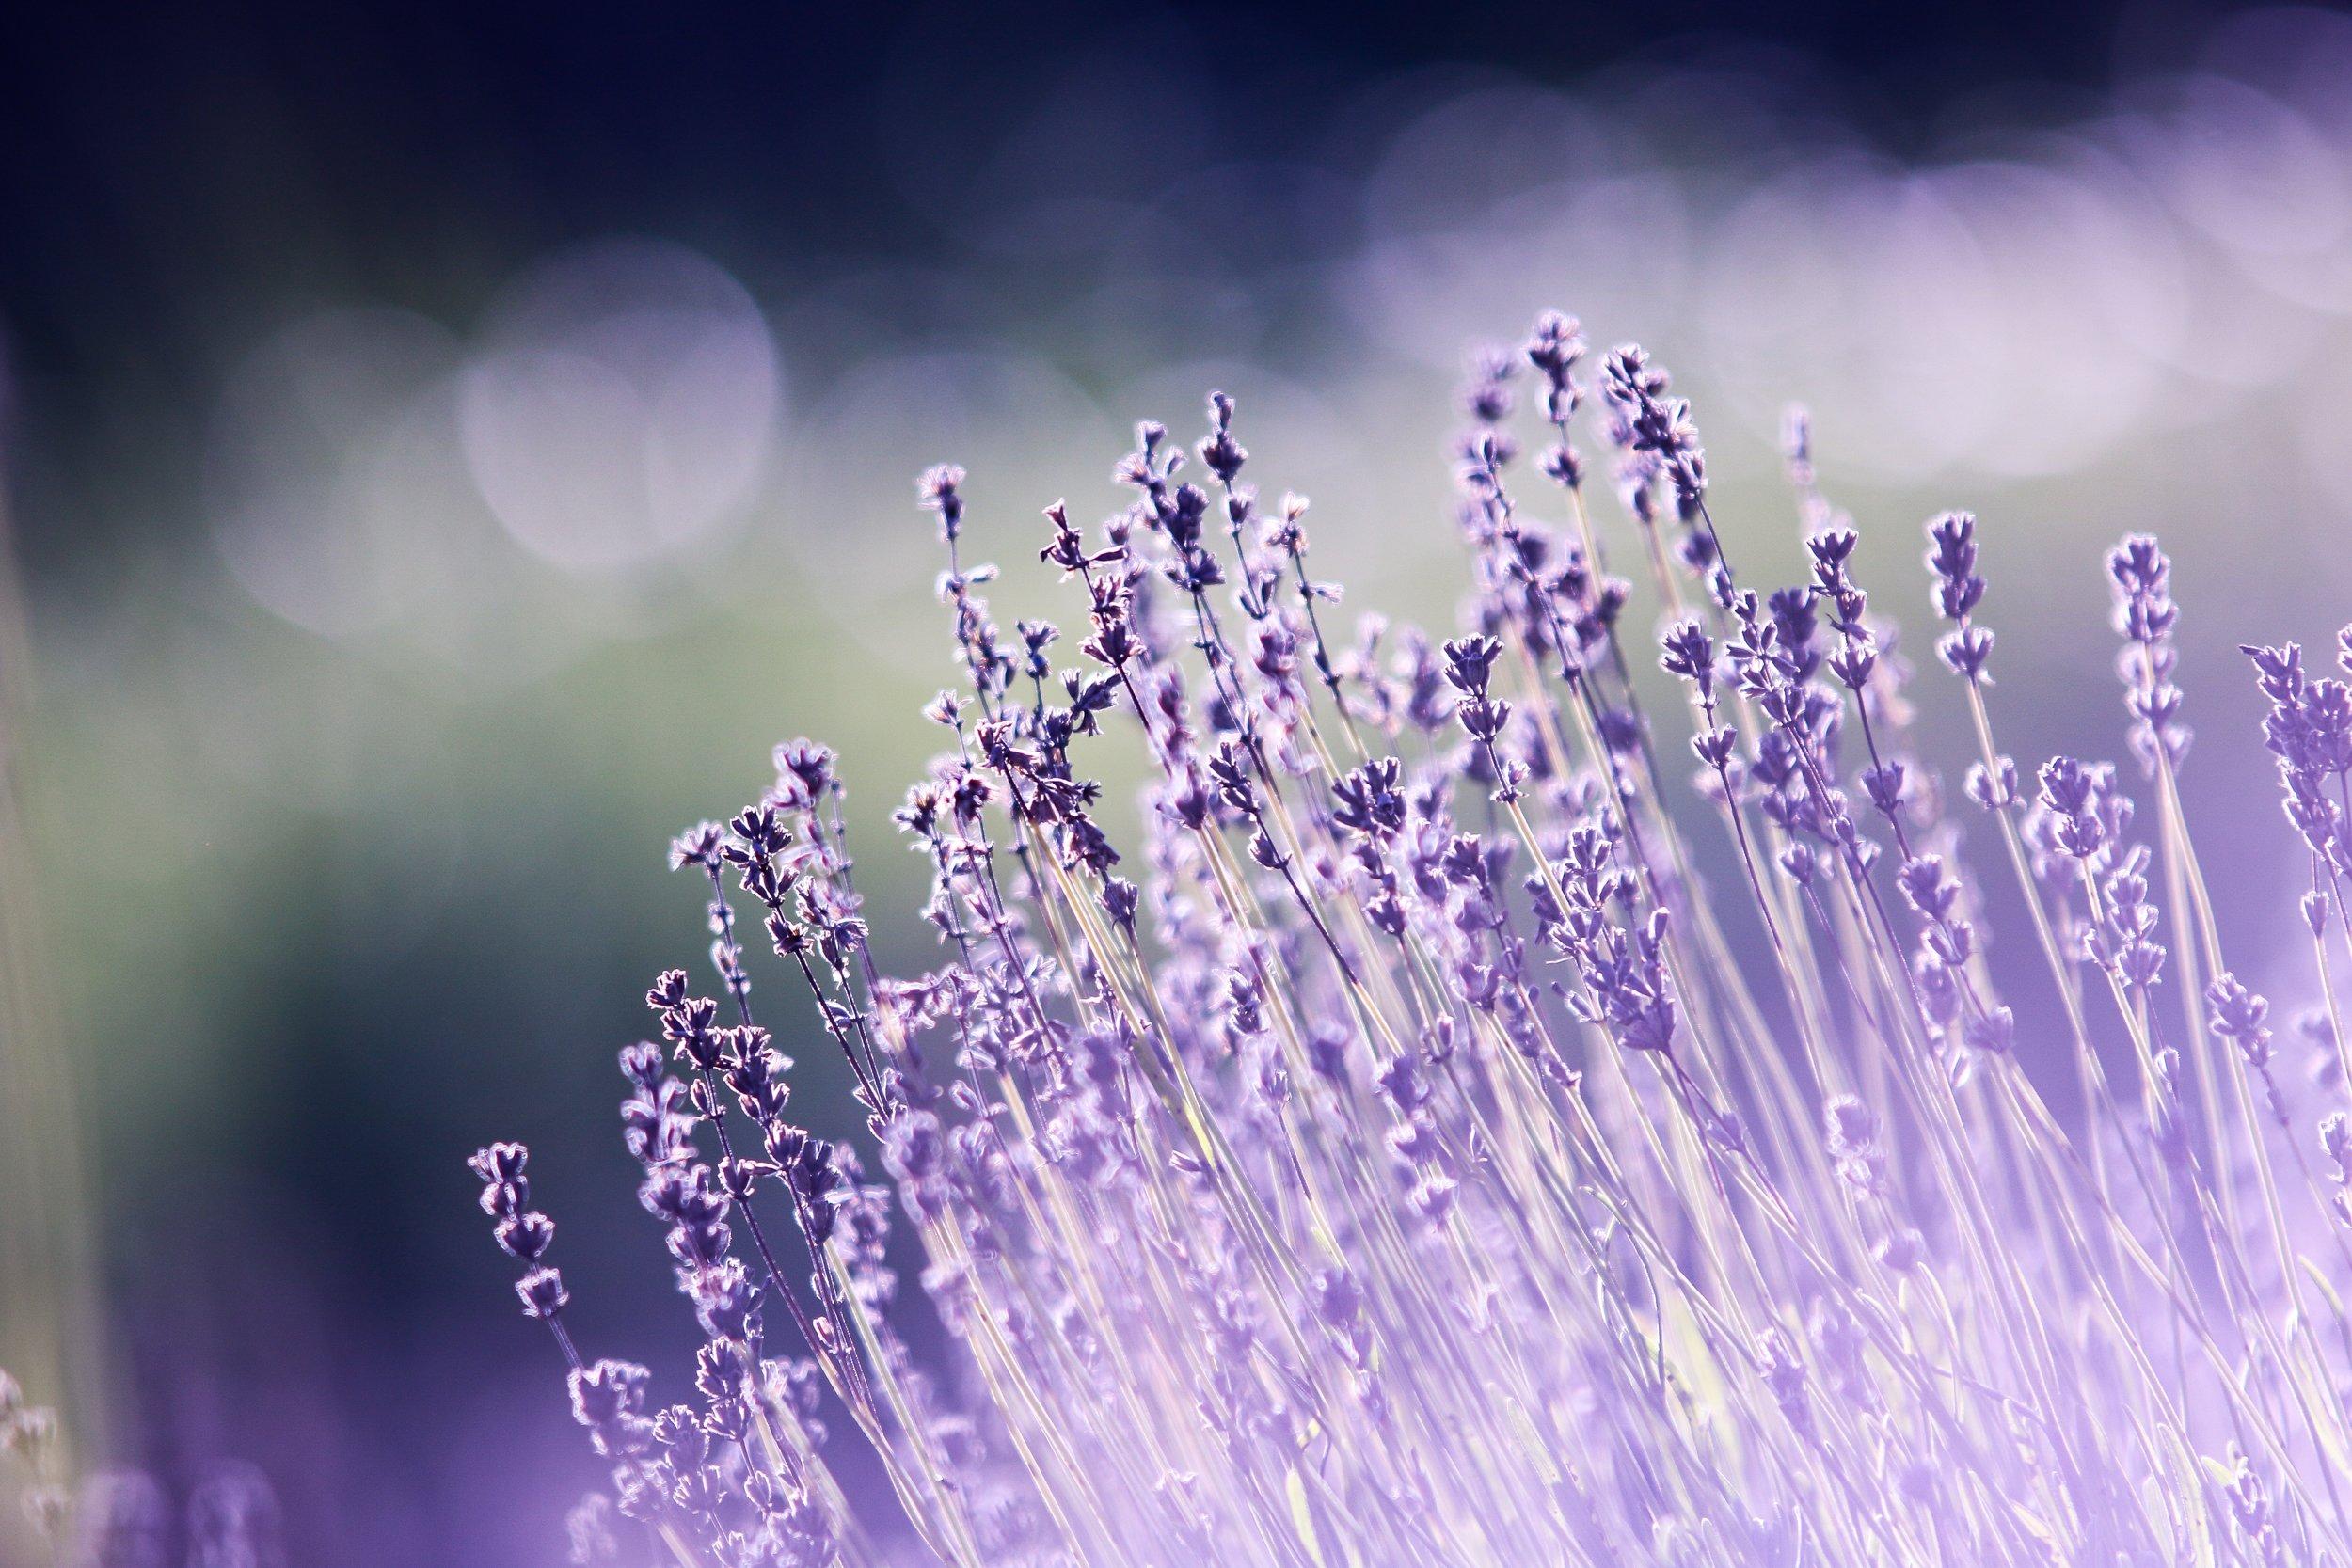 aromatherapy-beautiful-blooming-286763.jpg